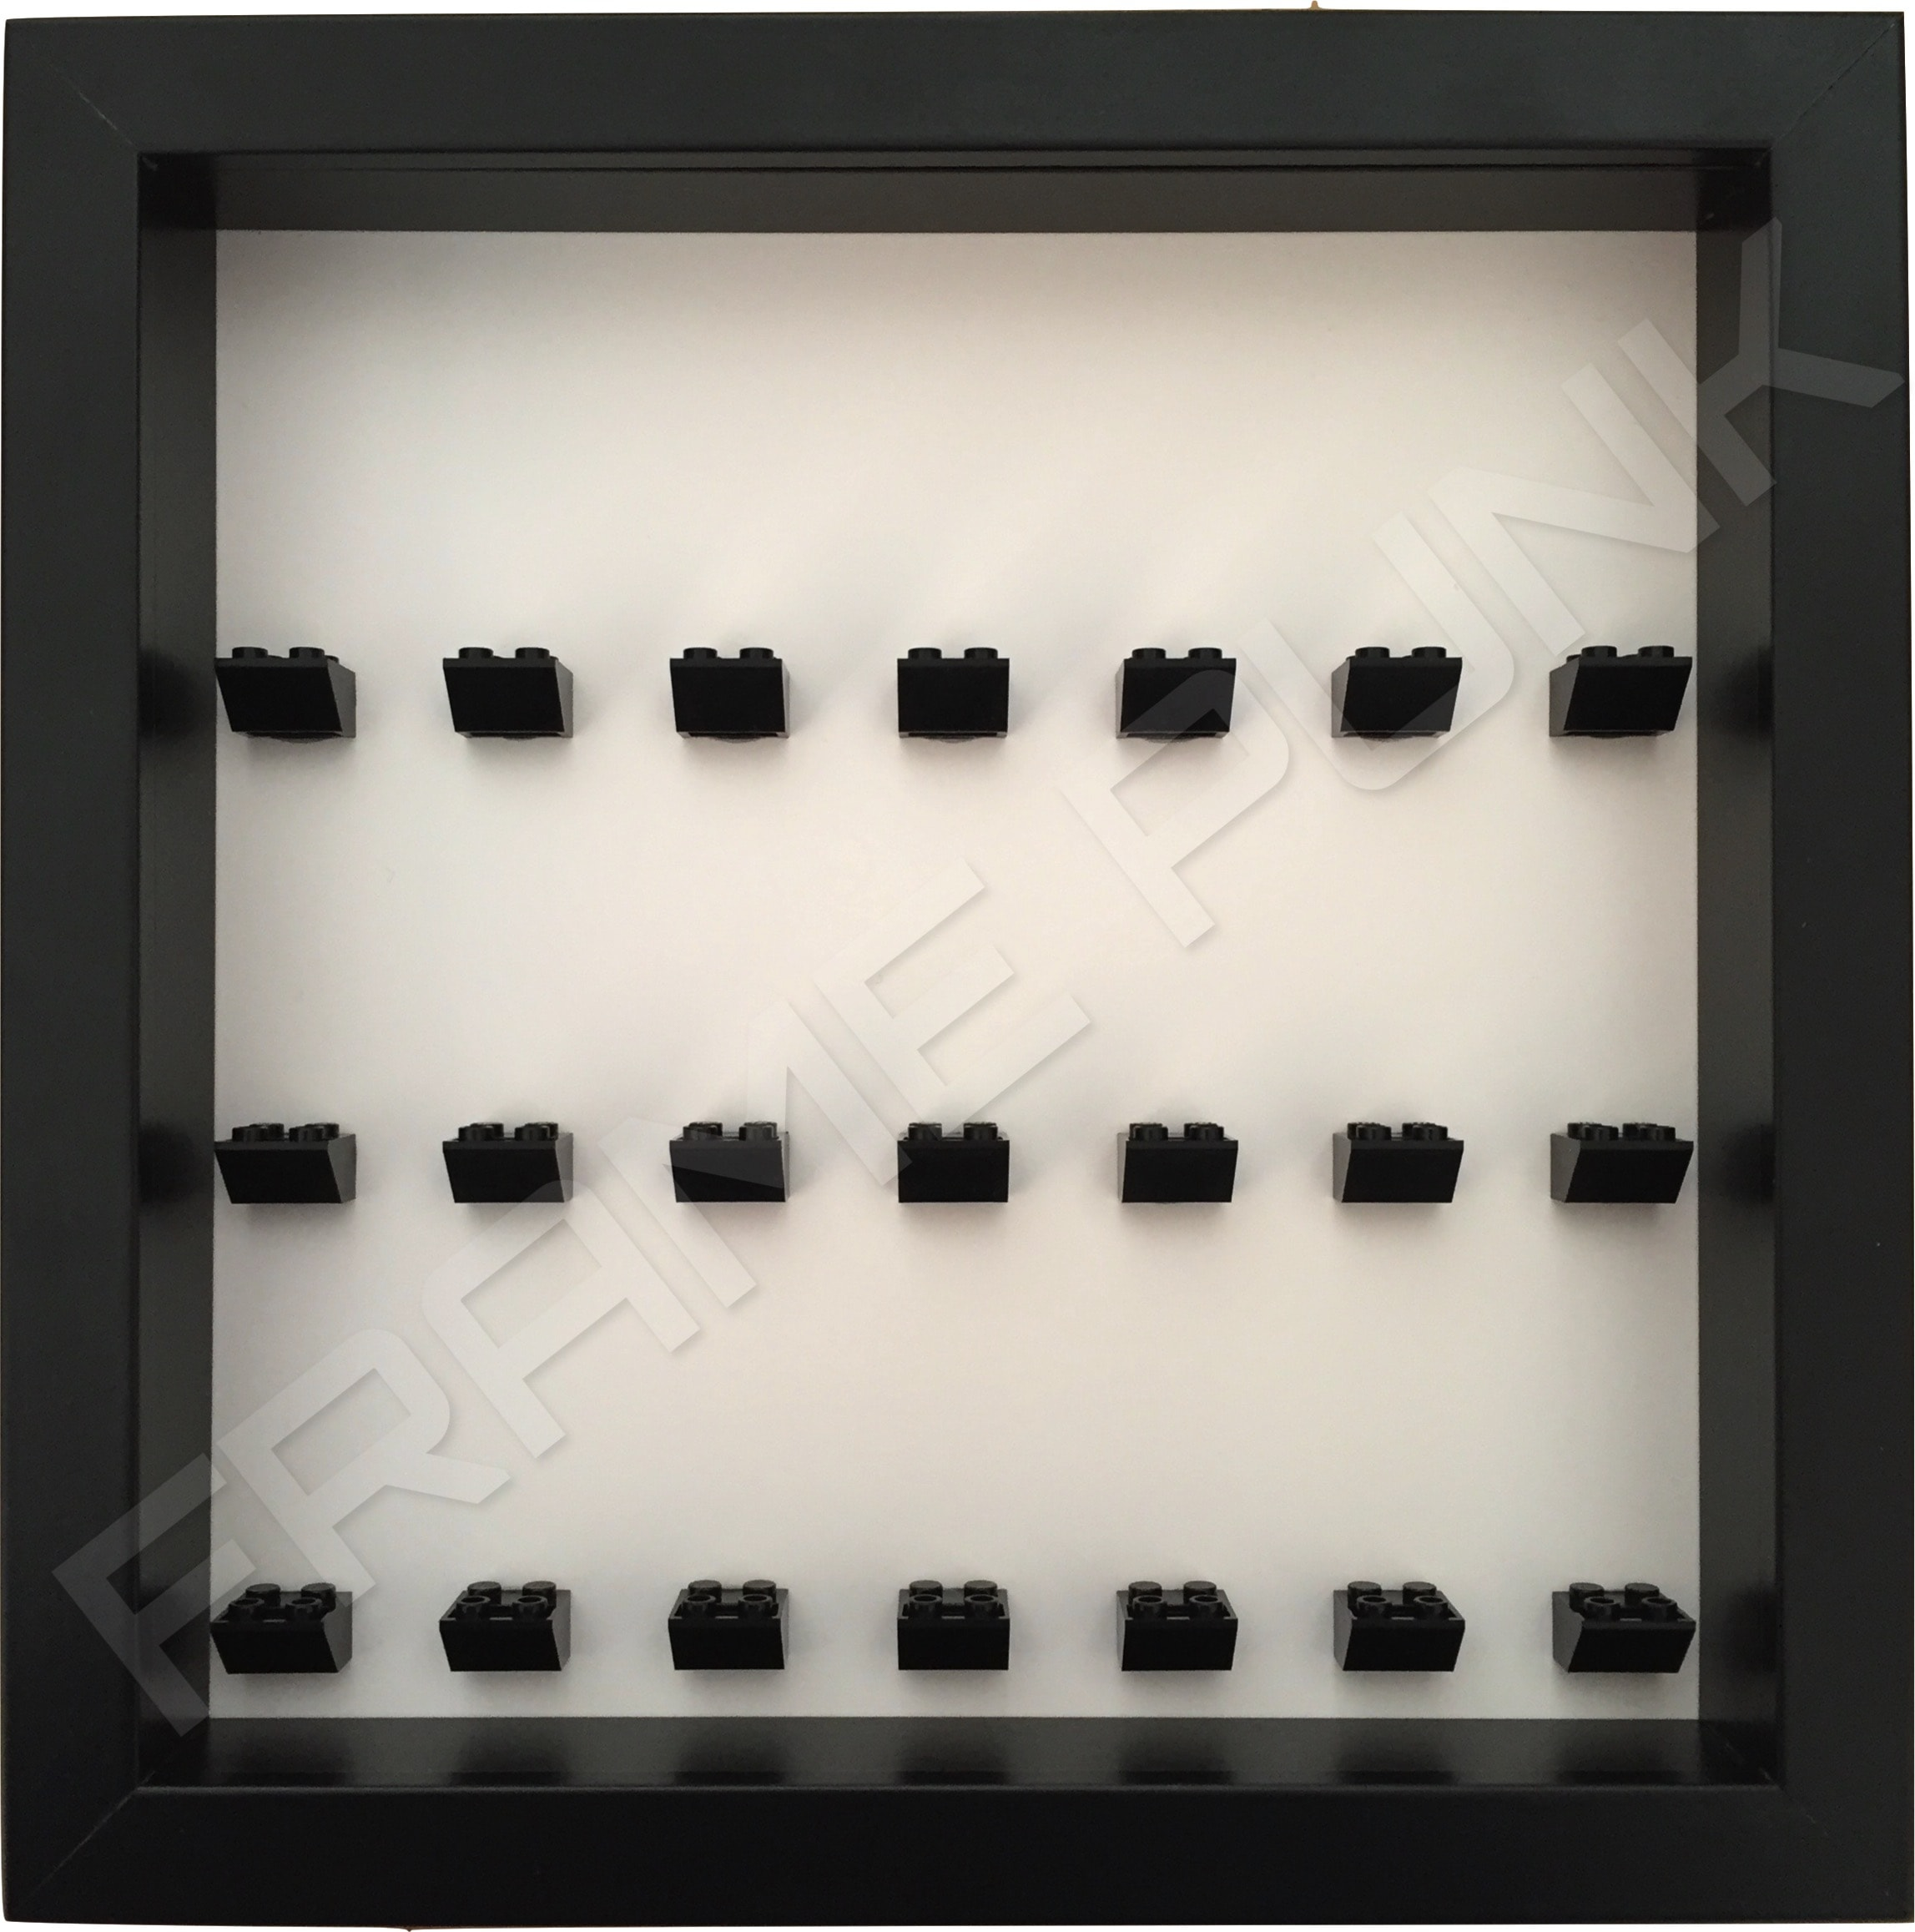 7 7 7 Lego brick frame formation